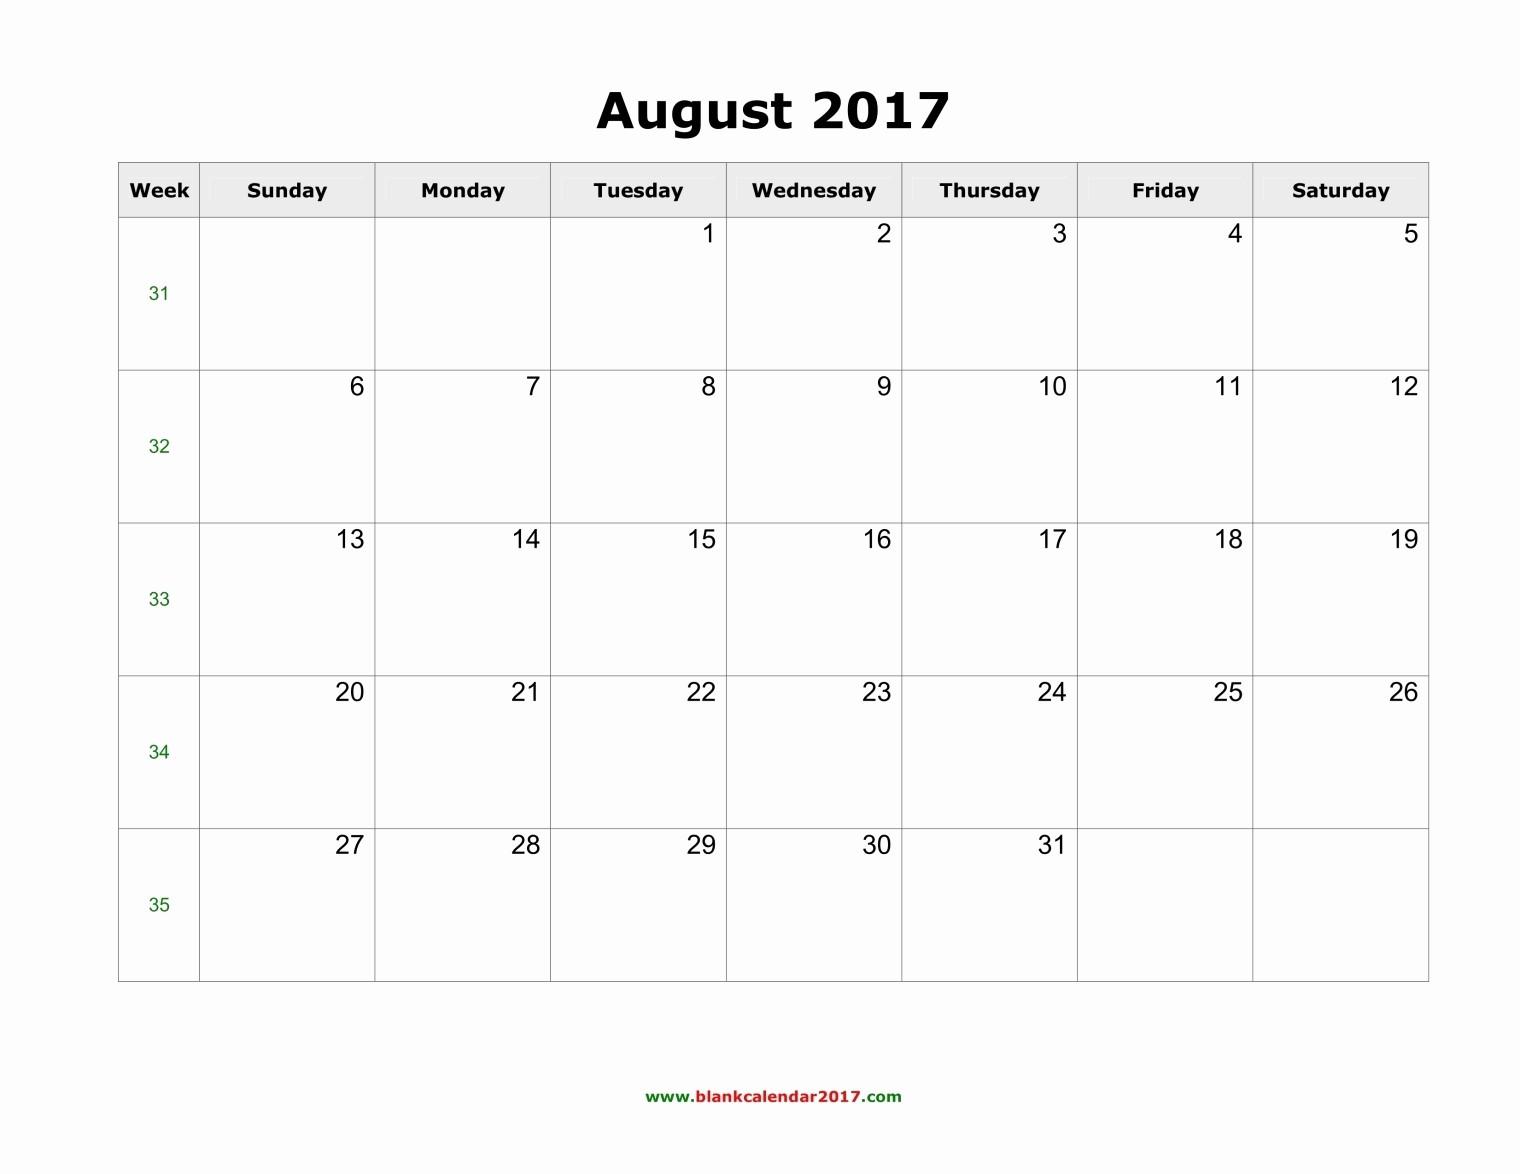 Blank Calendar Template August 2017 Beautiful August 2017 Calendar with Holidays